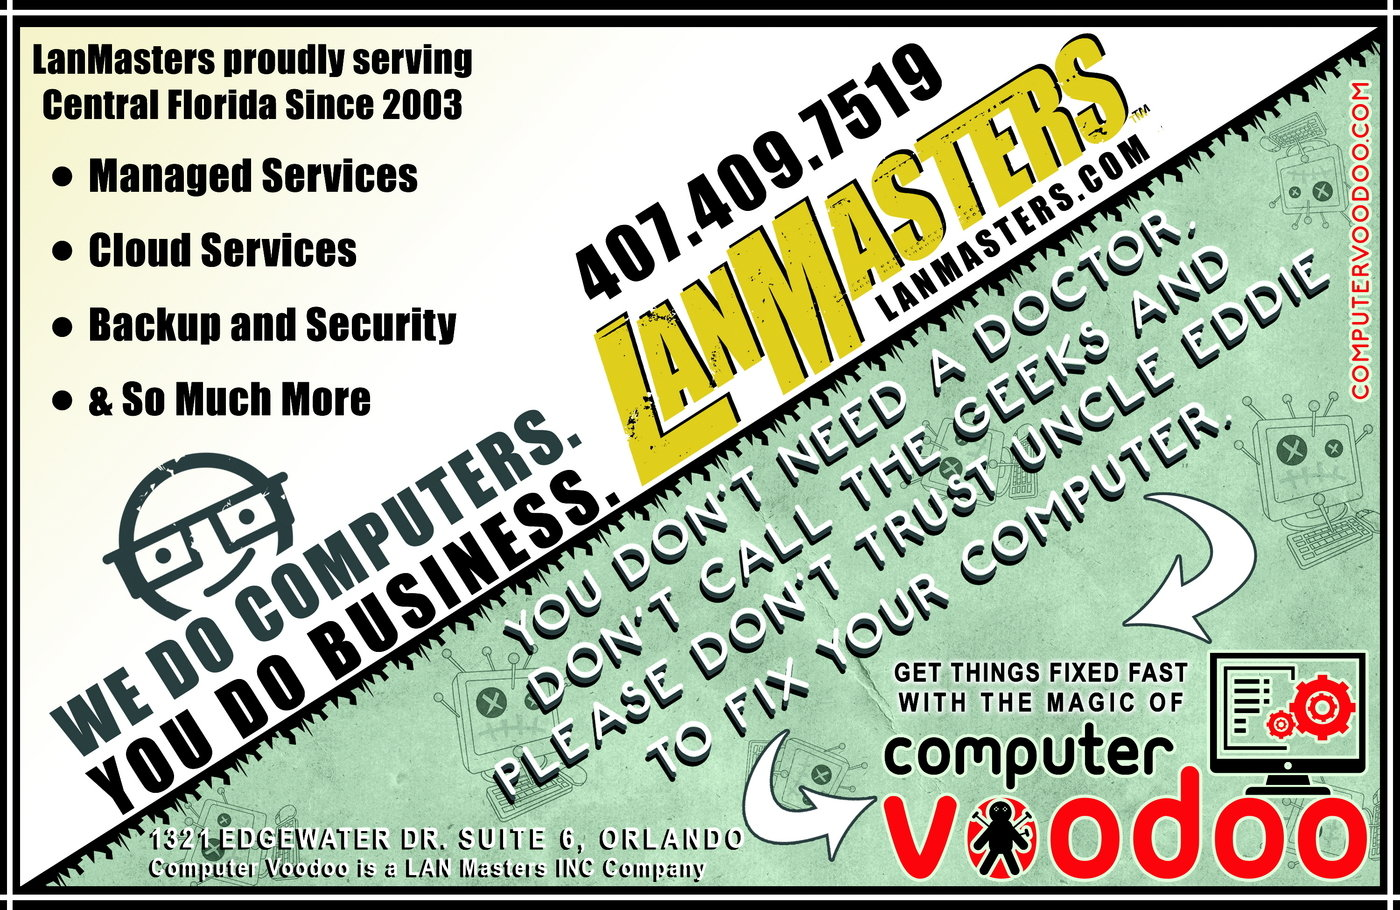 Computer Voodoo & LanMasters by Myke Rivera at Coroflot com